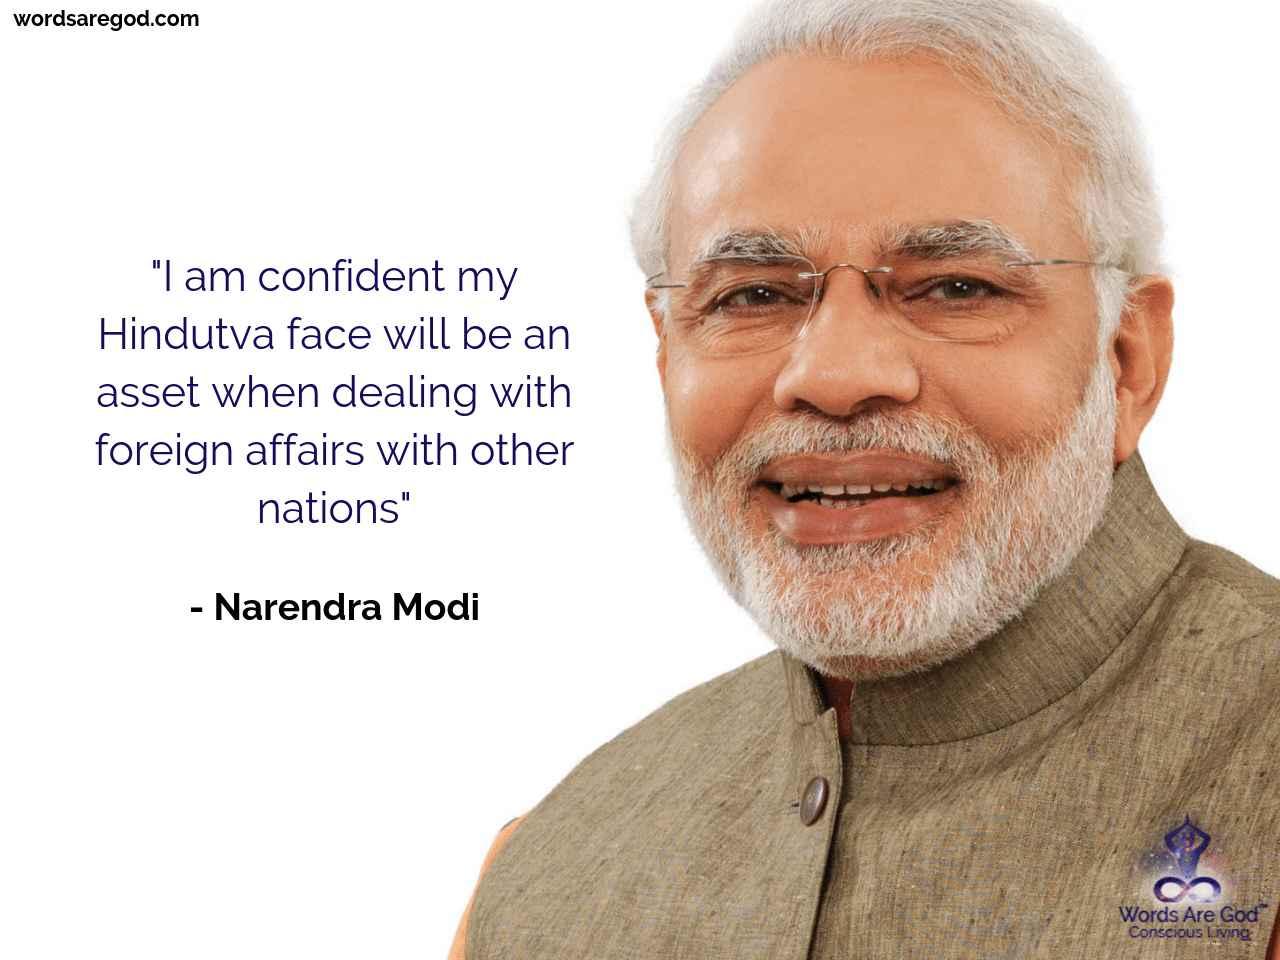 Narendra Modi Motivational Quote by Narendra Modi